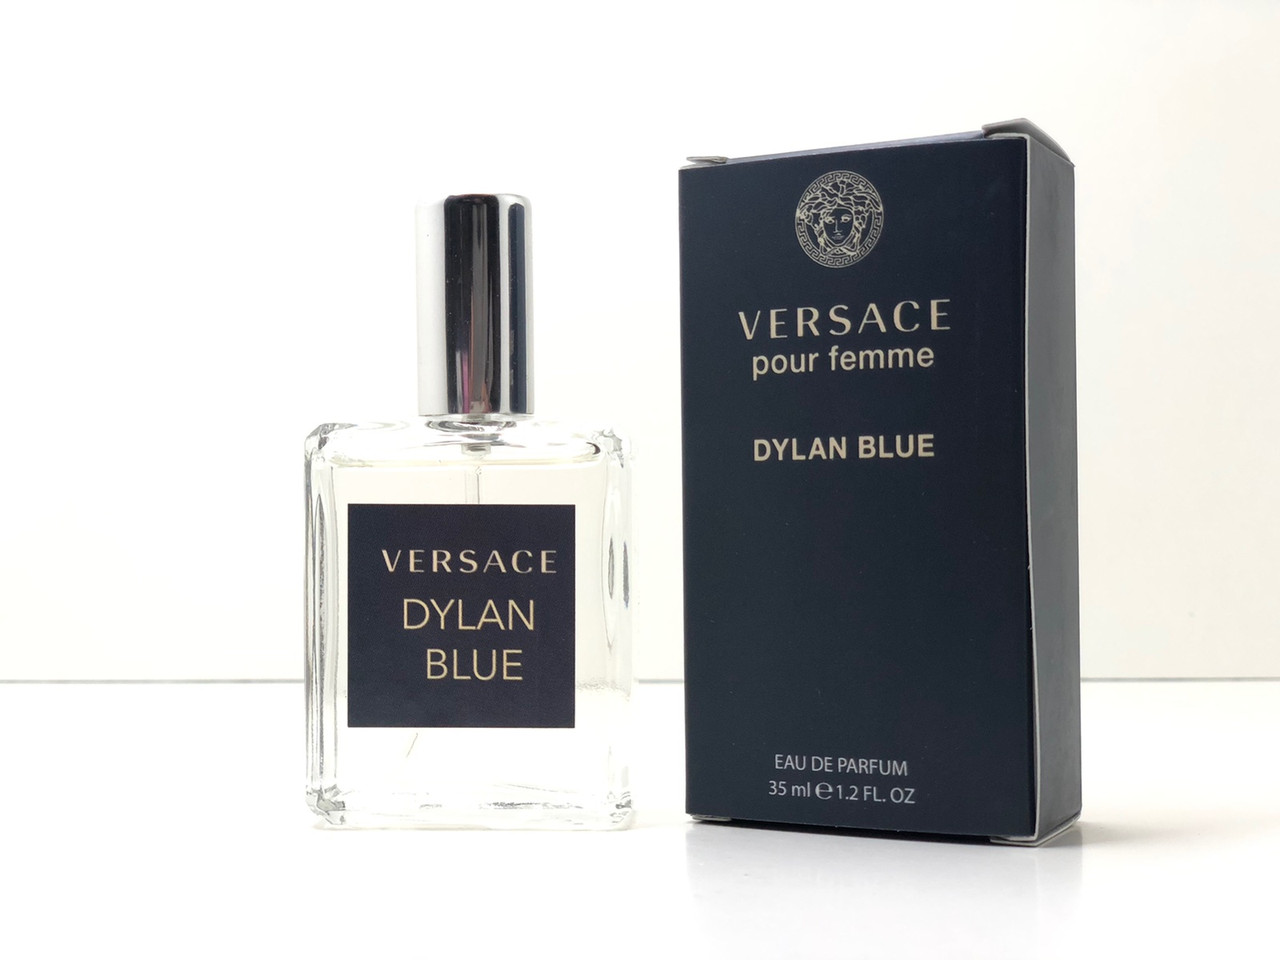 Мини парфюм Versace Dylan Blue Pour Femme (Версаче Дилан Блю Пур Фемм) 35 мл